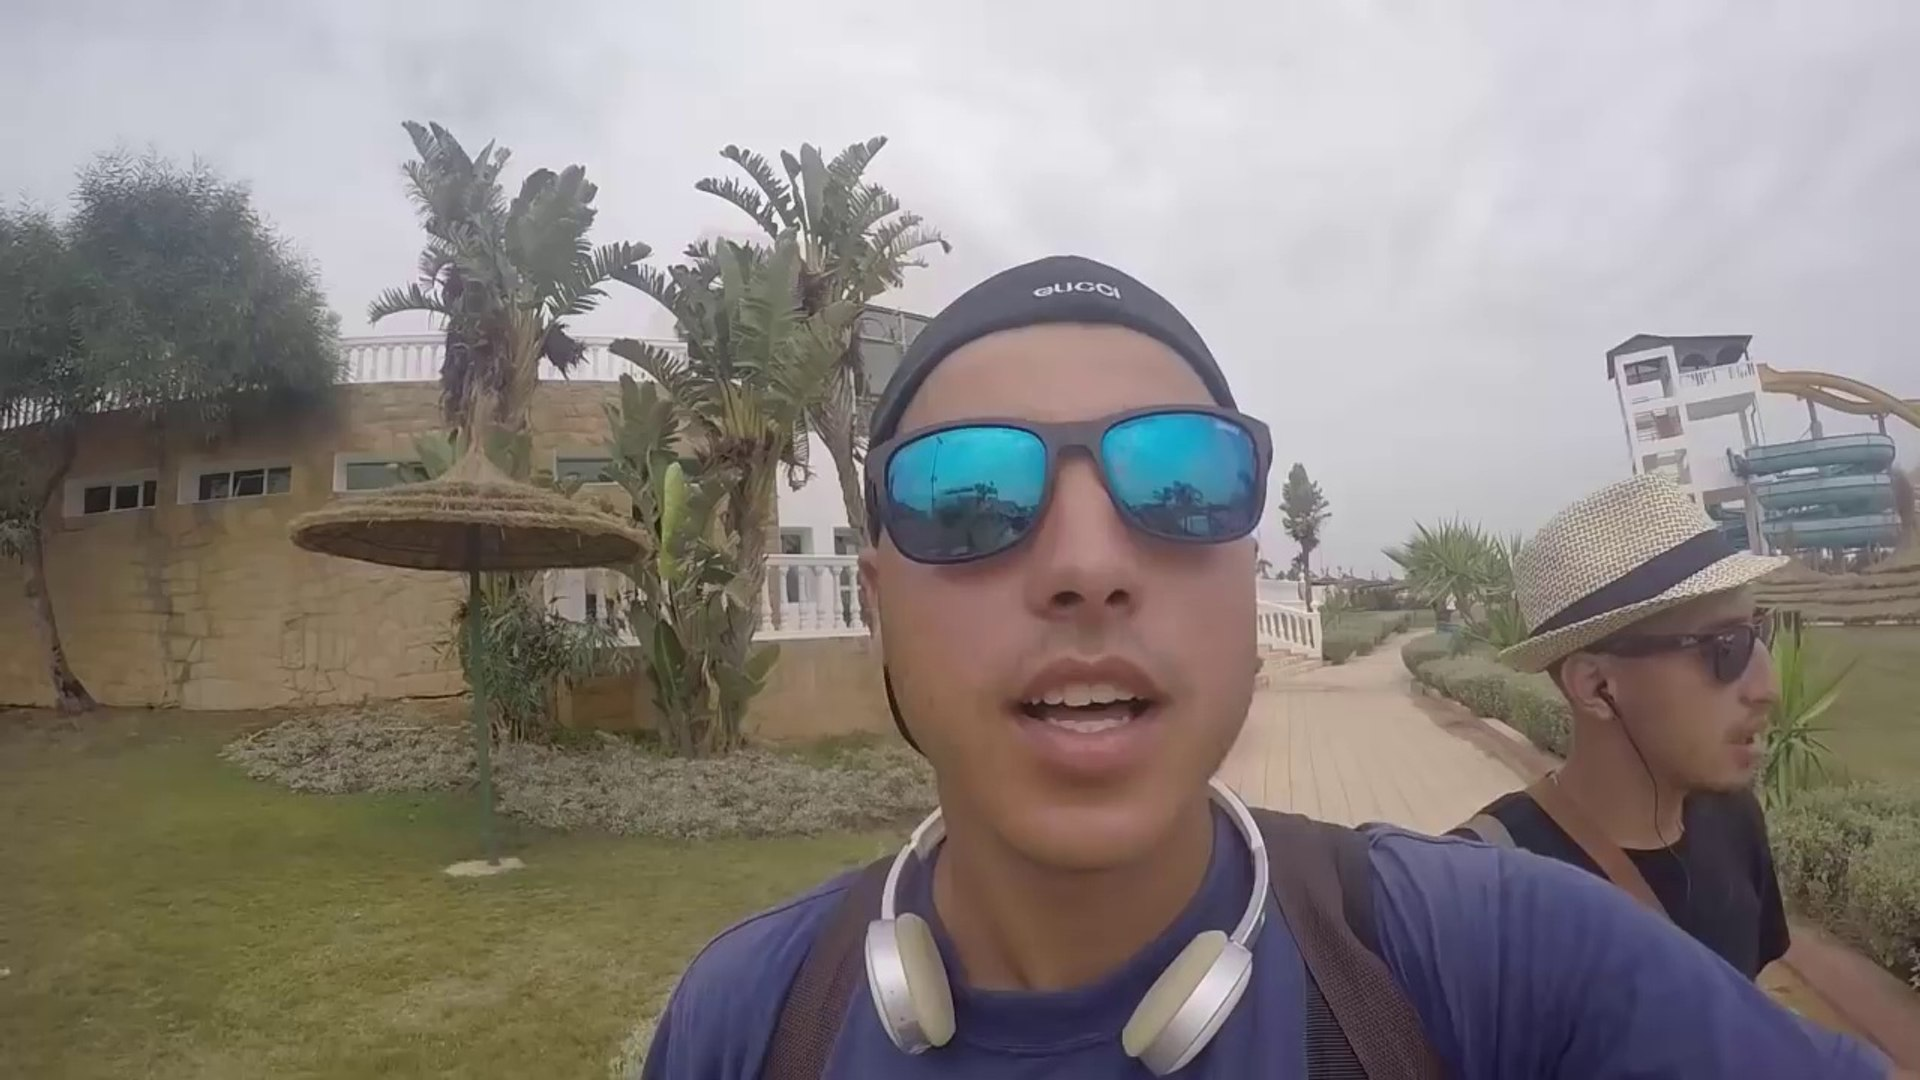 My Trip around North of Morocco_Part 4 Titouen , SMIR PARK Gopro hero4 black HD 2015